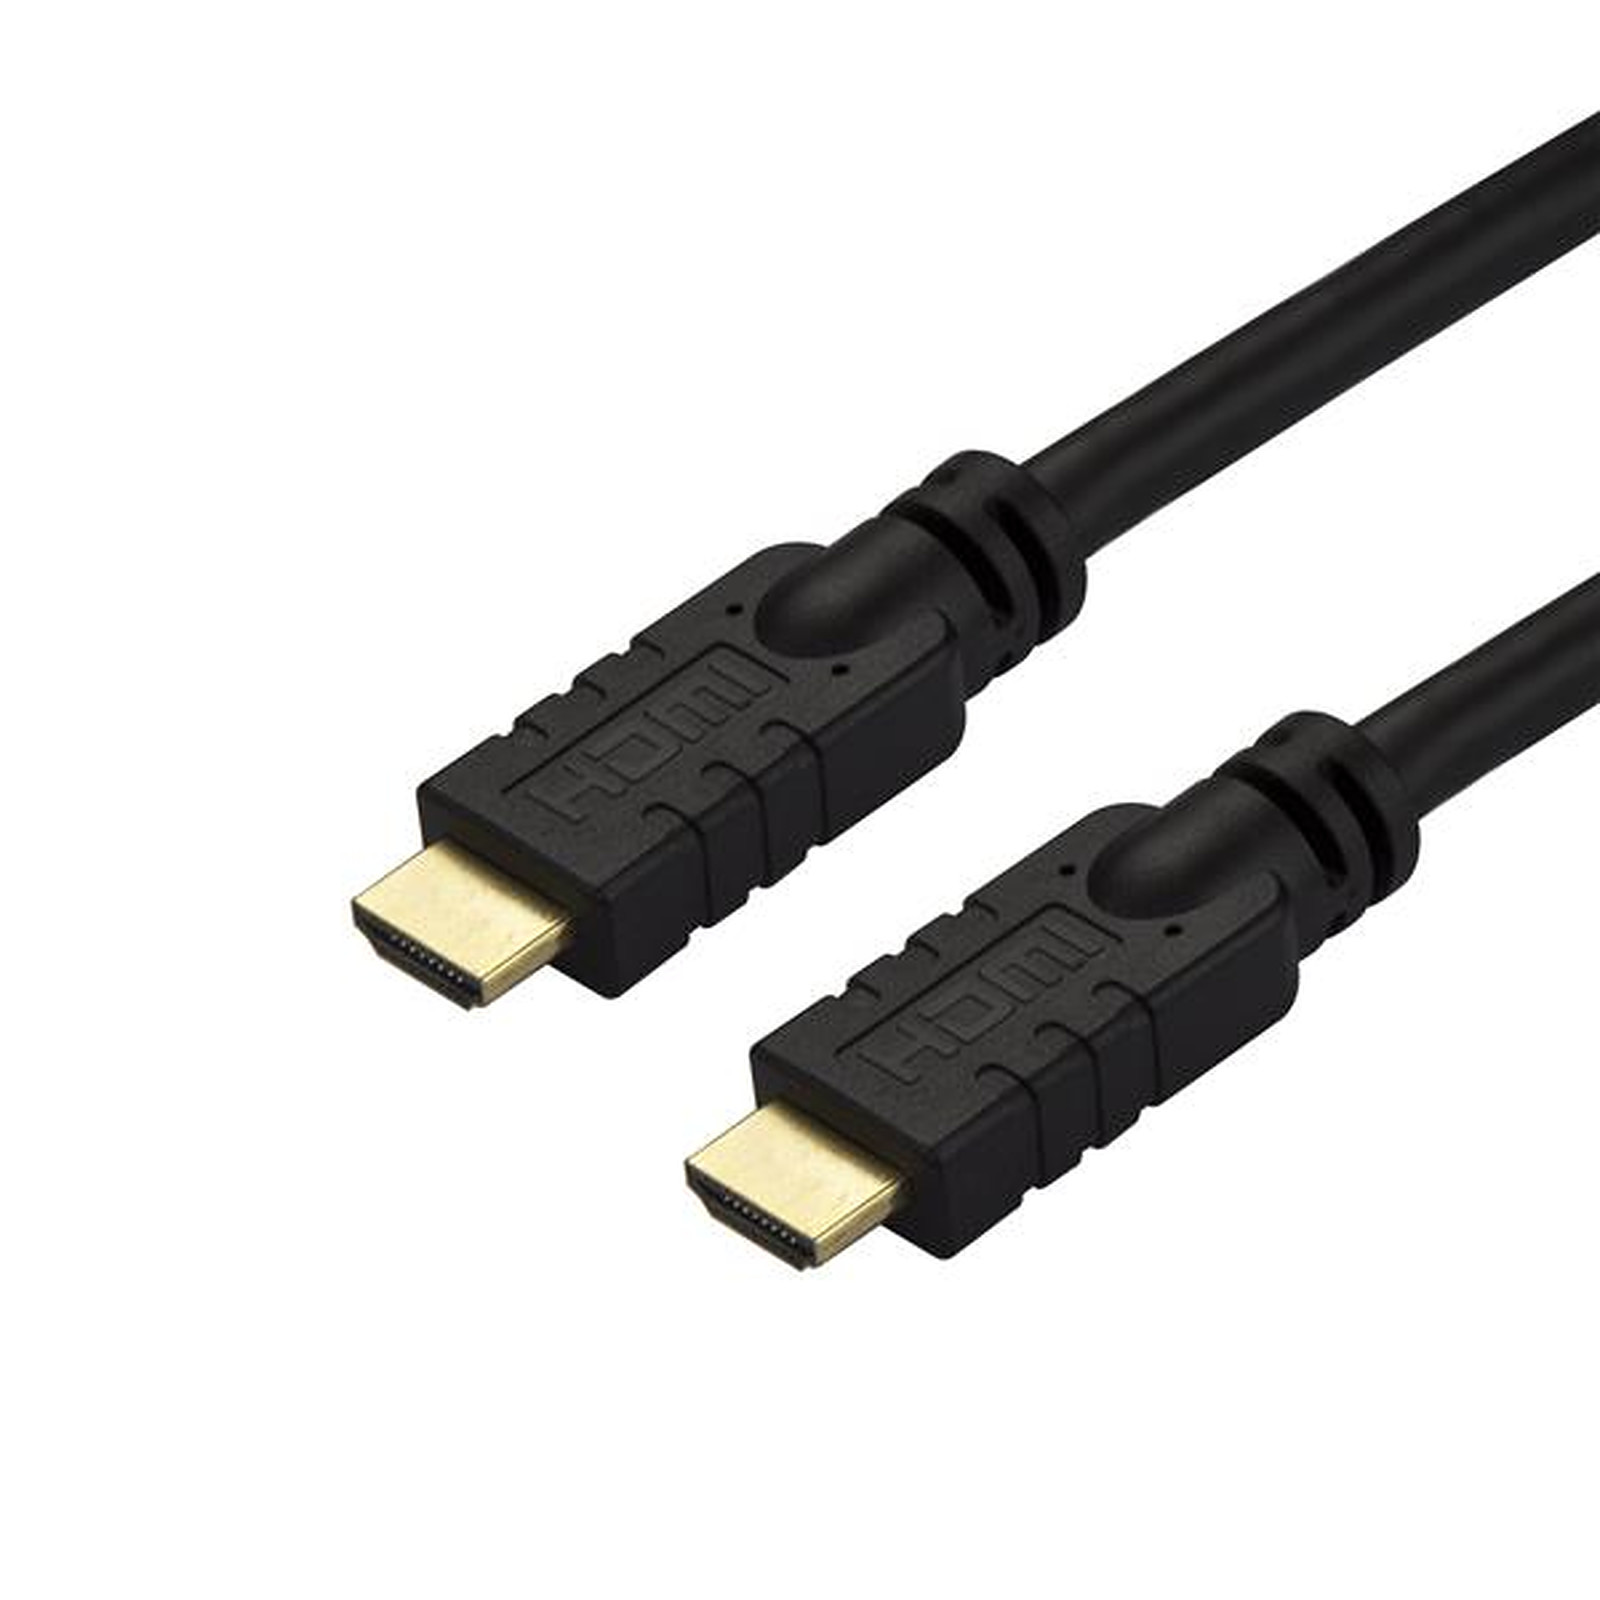 StarTech.com Câble HDMI haute vitesse actif 4K 60 Hz de 10 m